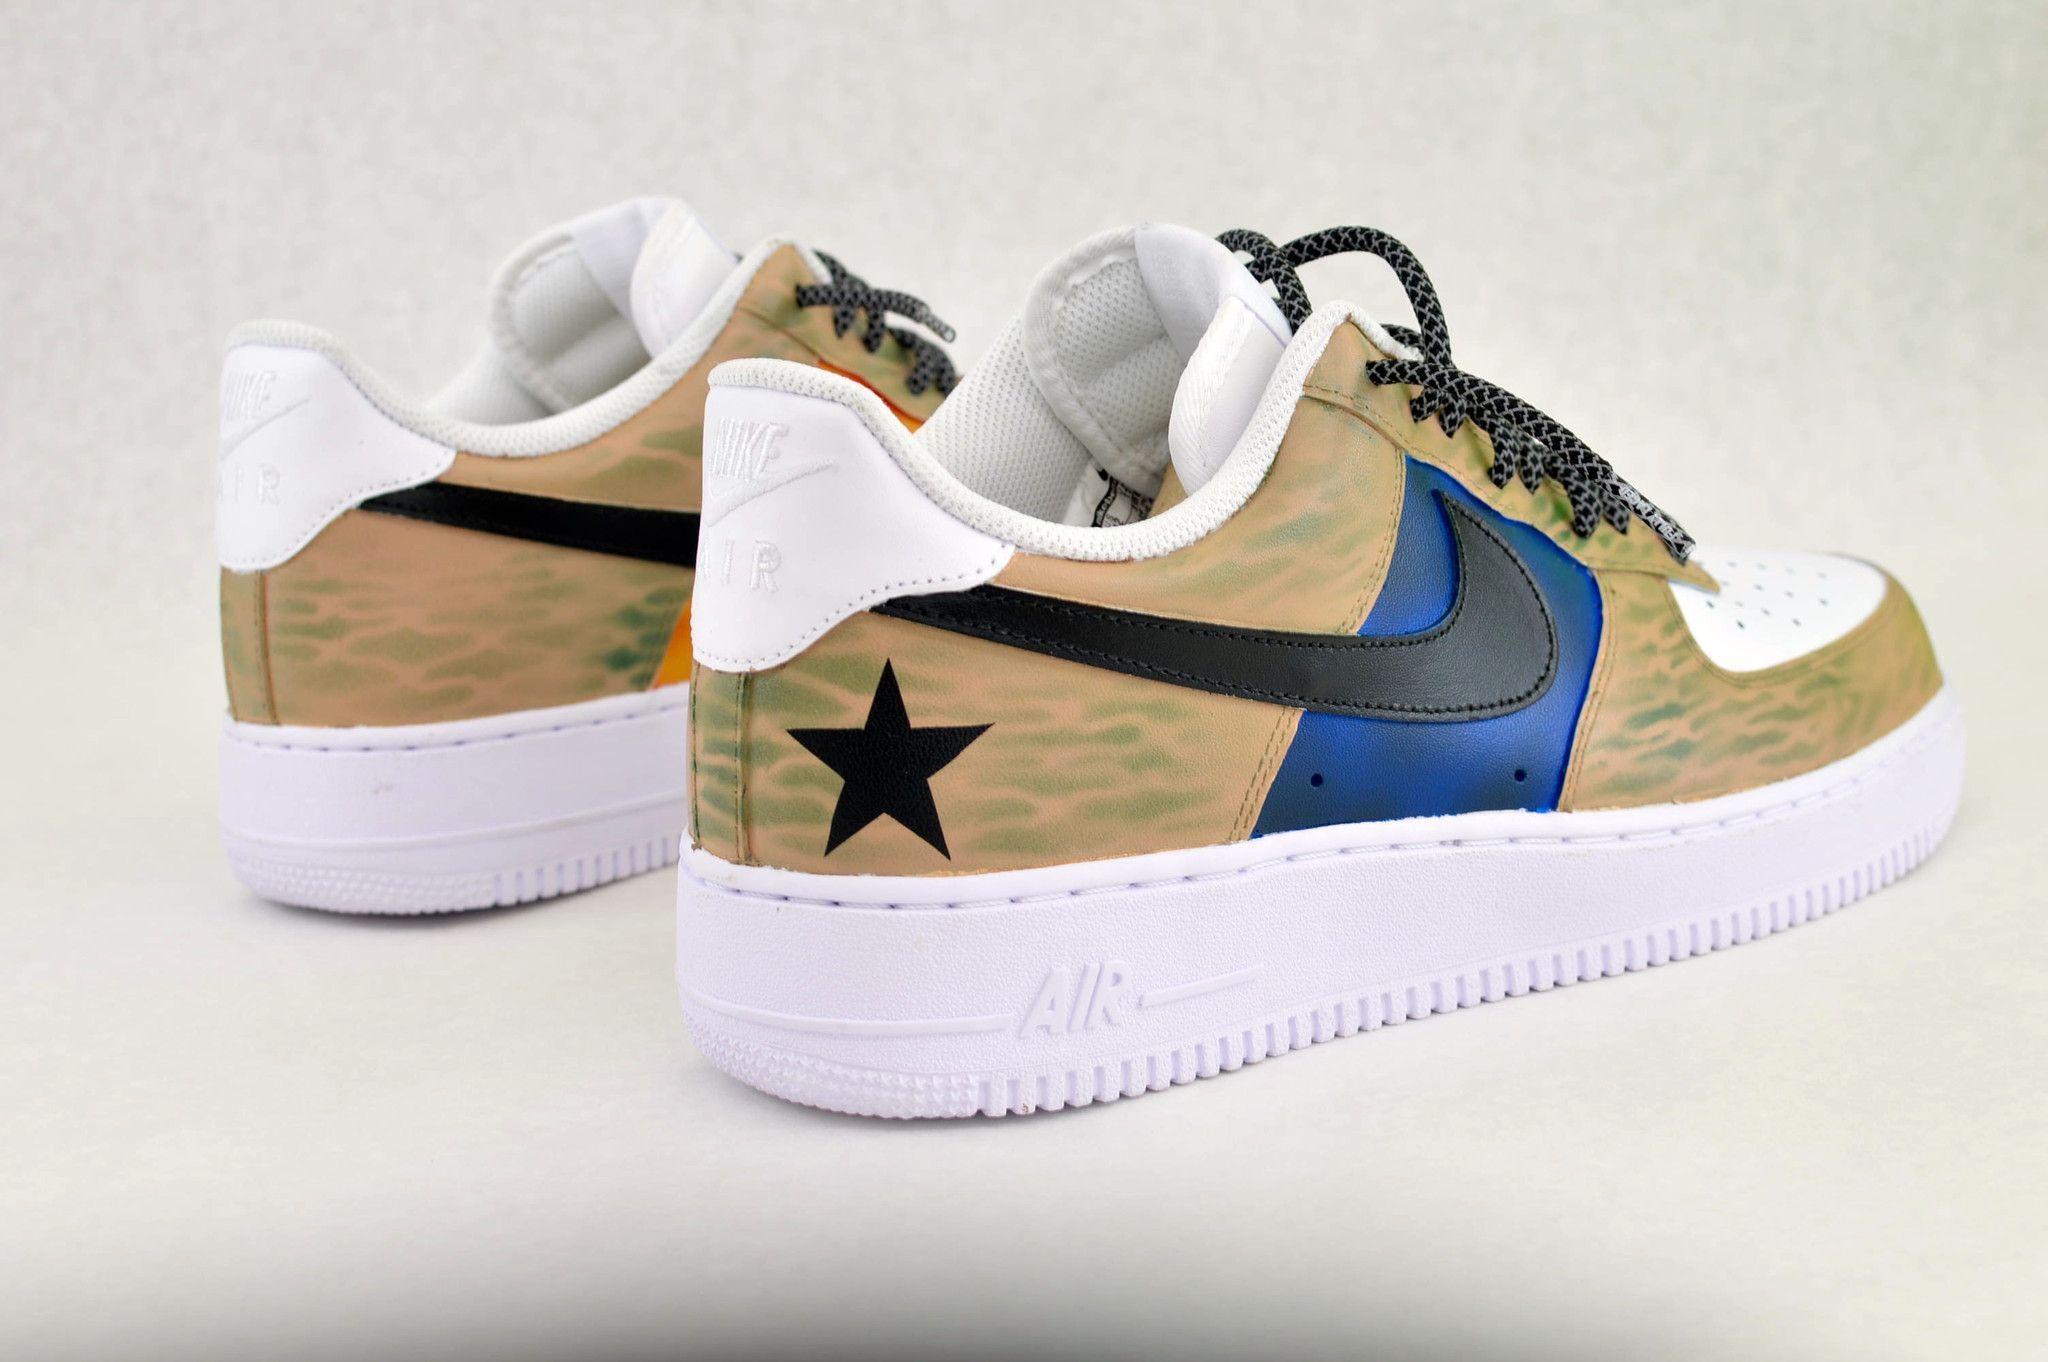 Us Military Custom Hand Painted Nike Air Force 1 Sneakers Army Marines Theme Sneakers Painted Nikes Nike Air